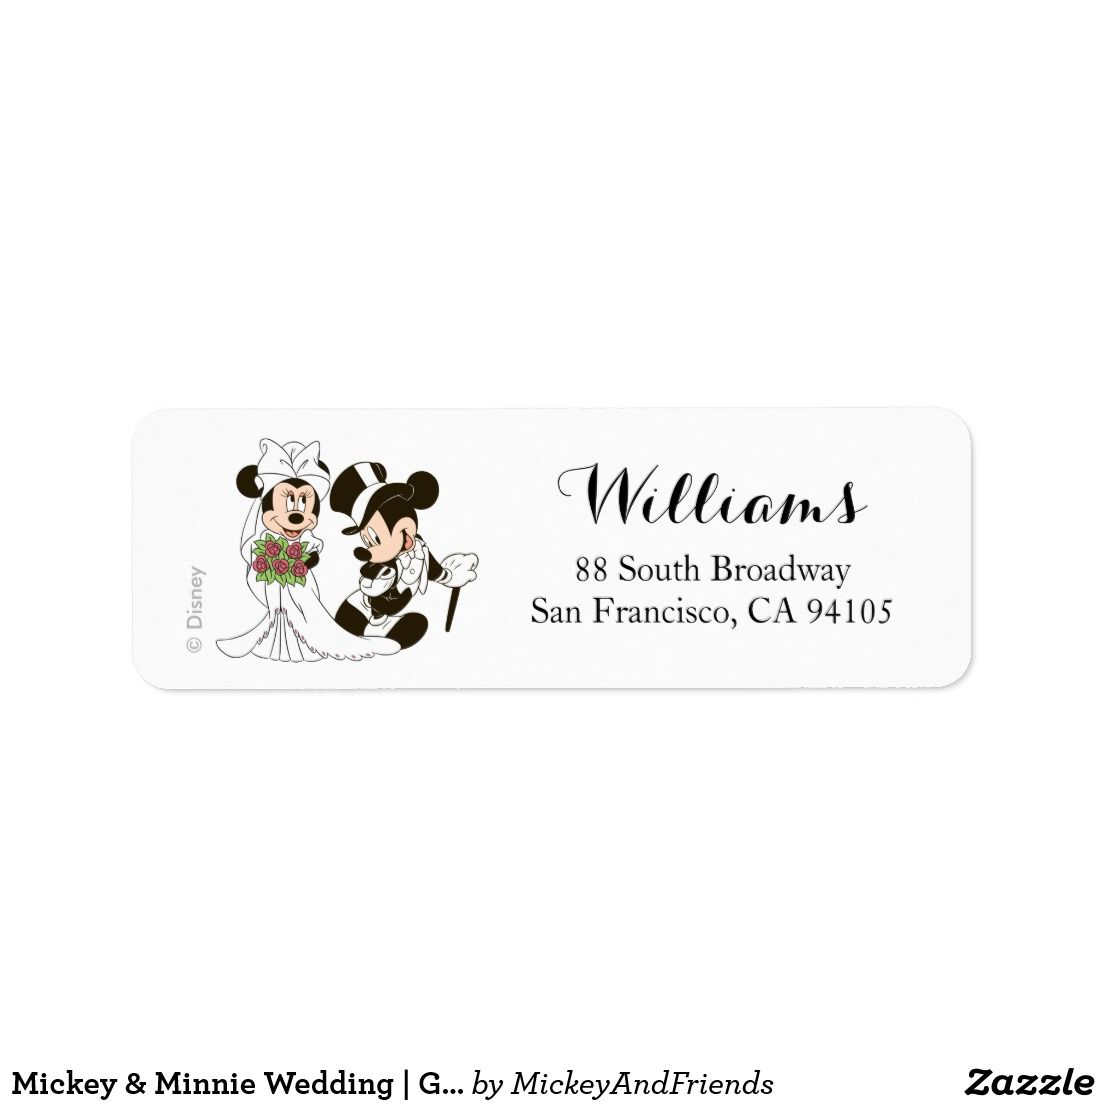 mickey minnie wedding getting married label pinterest disney